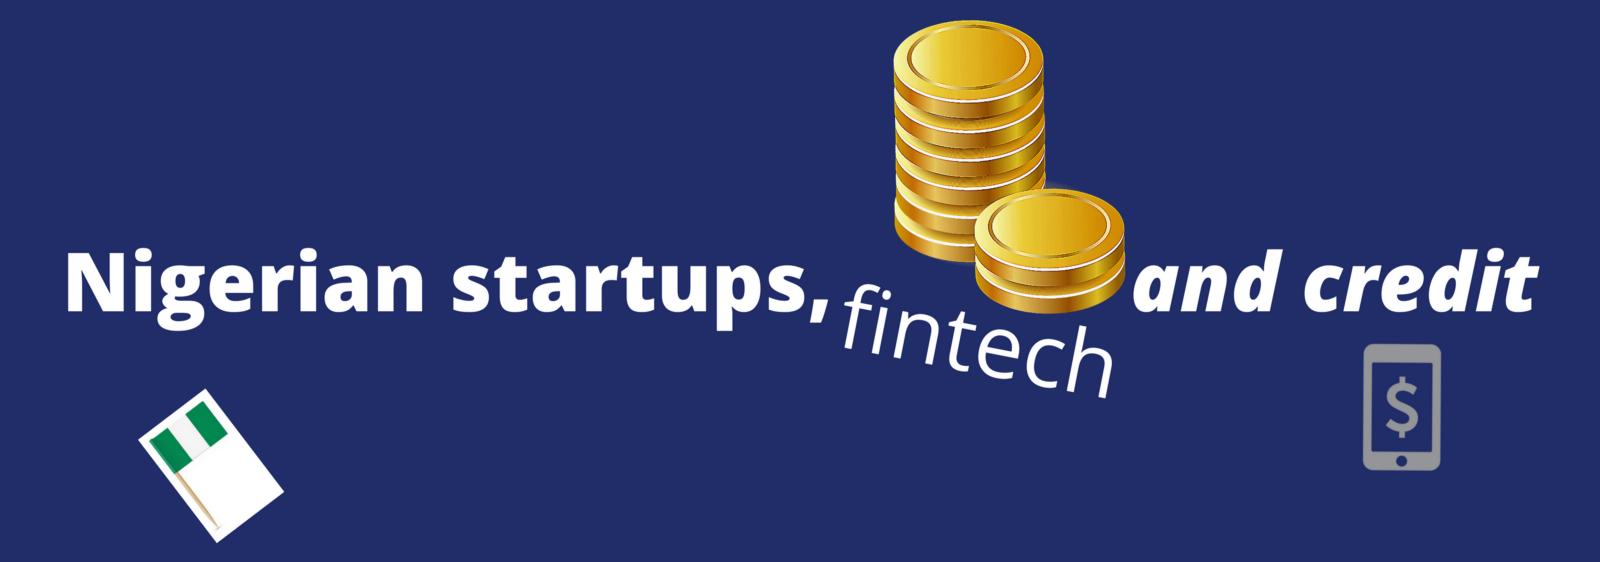 fintech startups in Nigeria